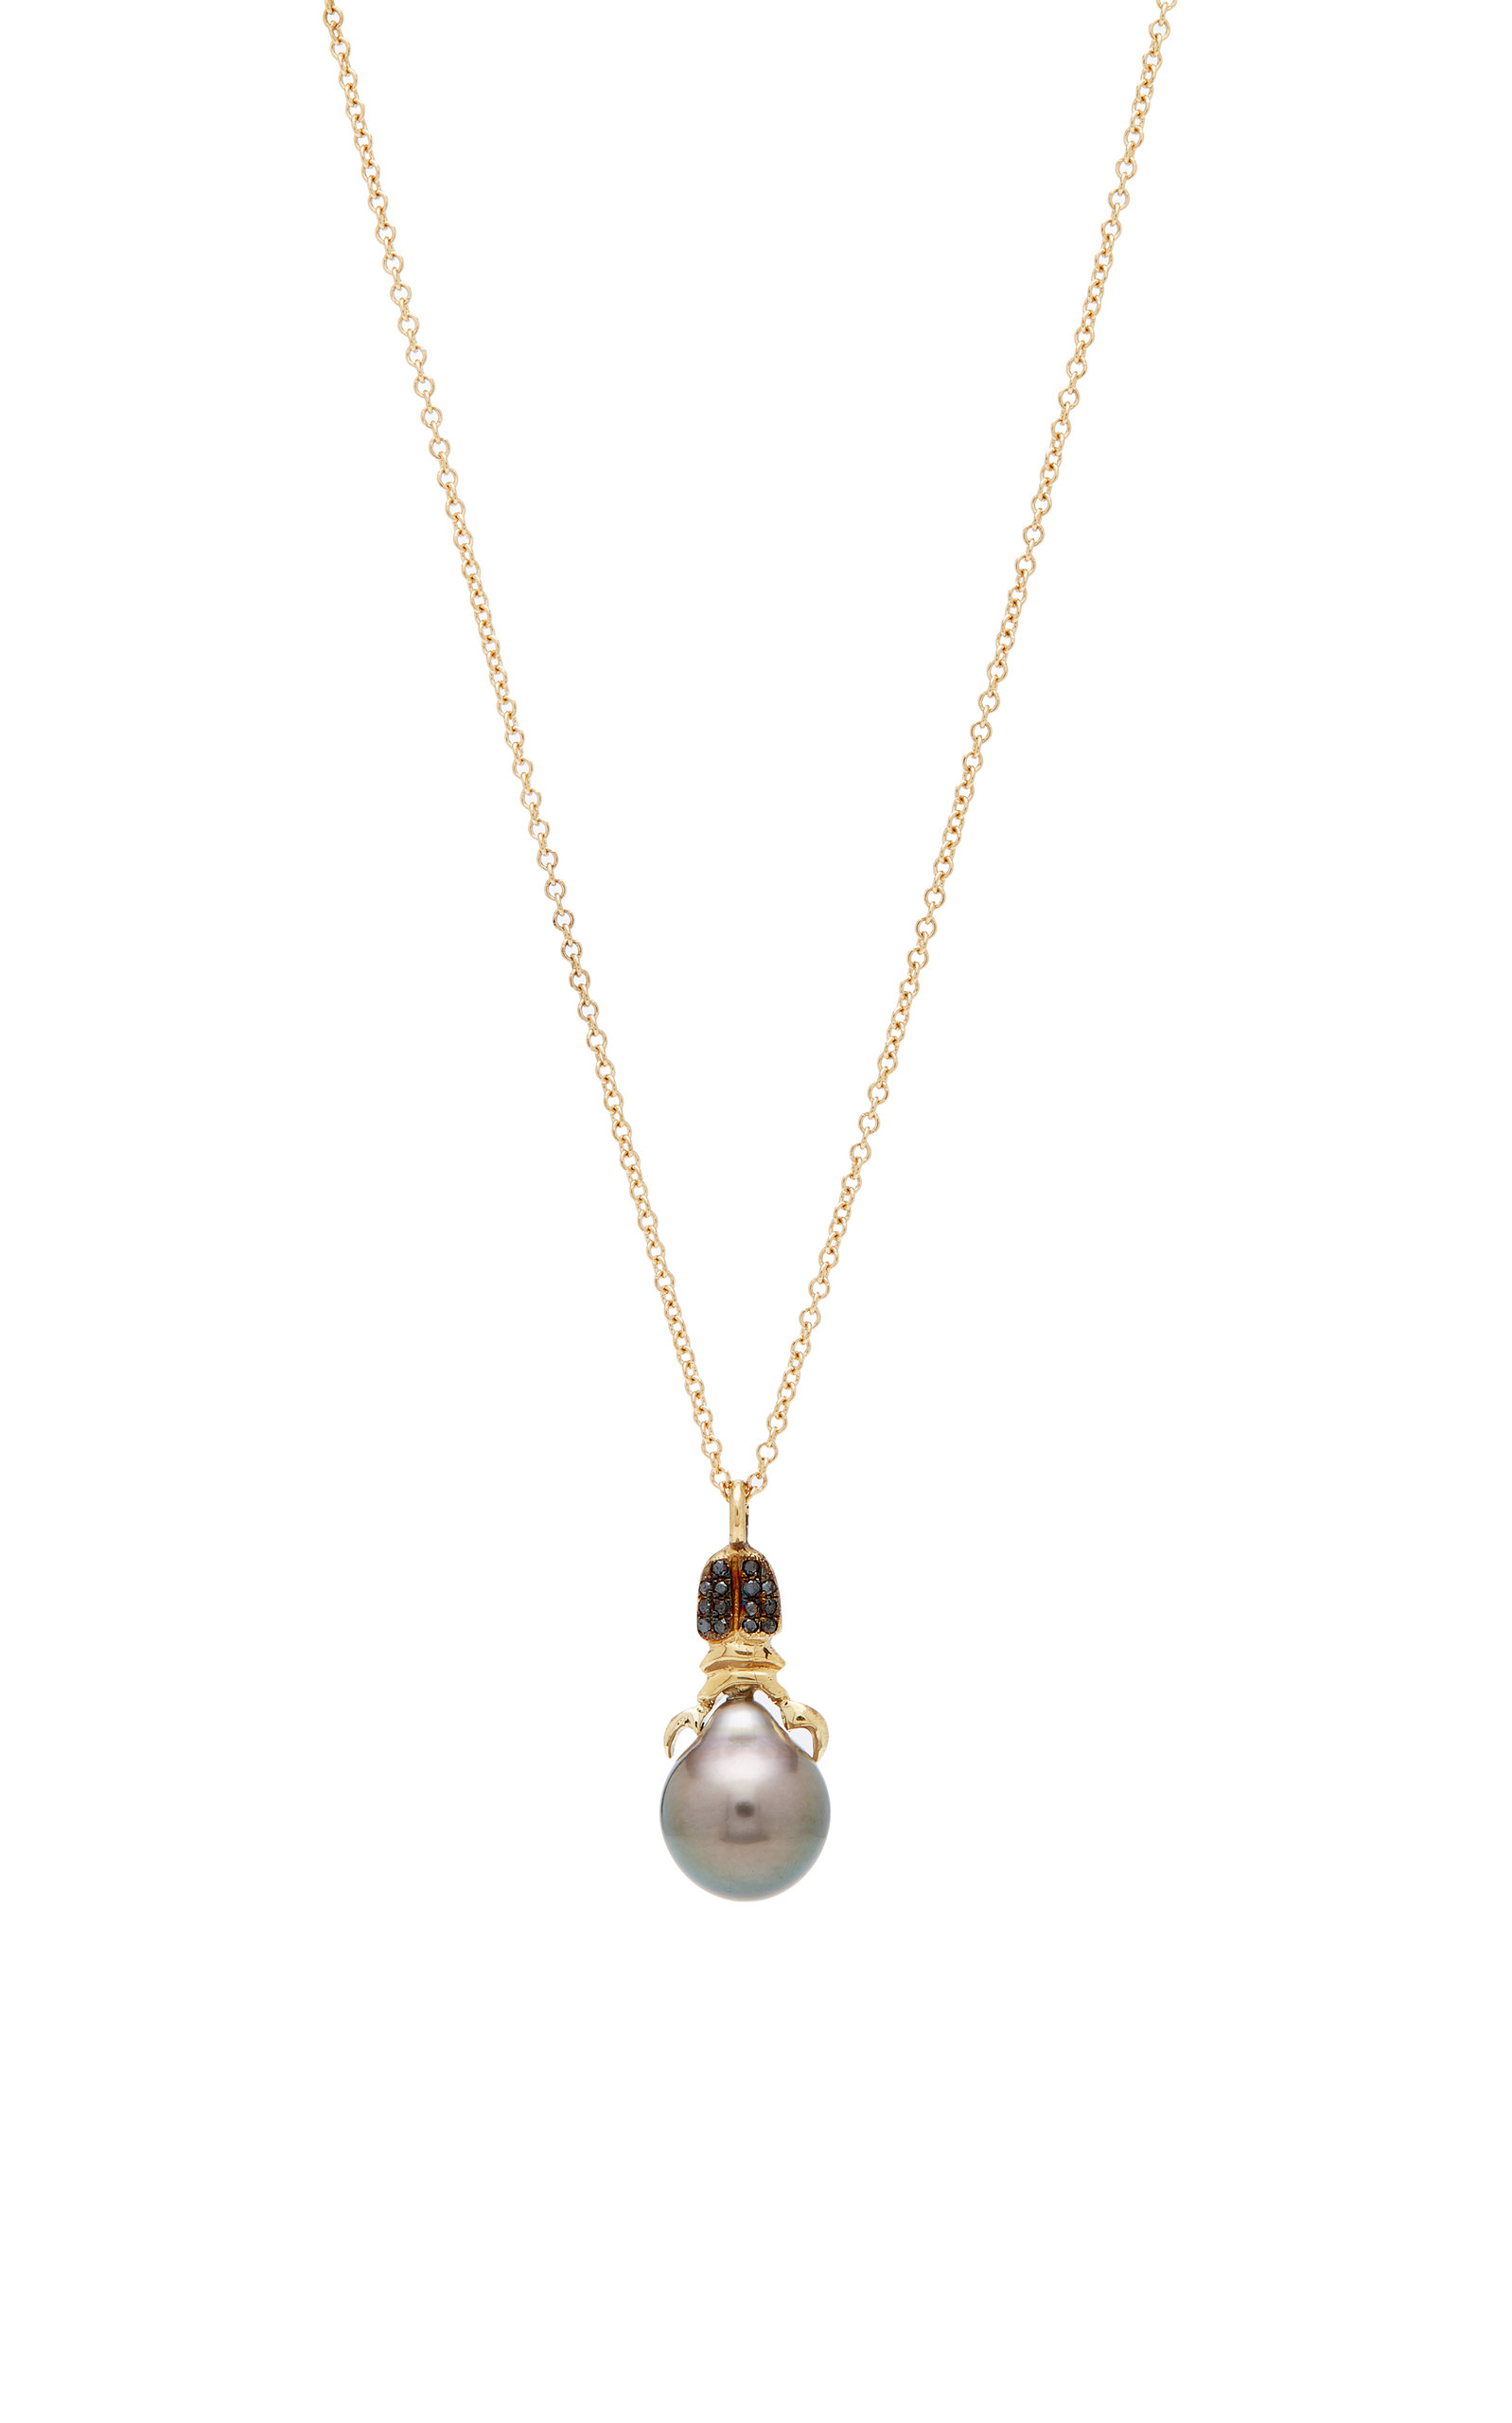 Khepri 18K Rose Gold Garnet And Pearl Necklace Daniela Villegas 95ywv